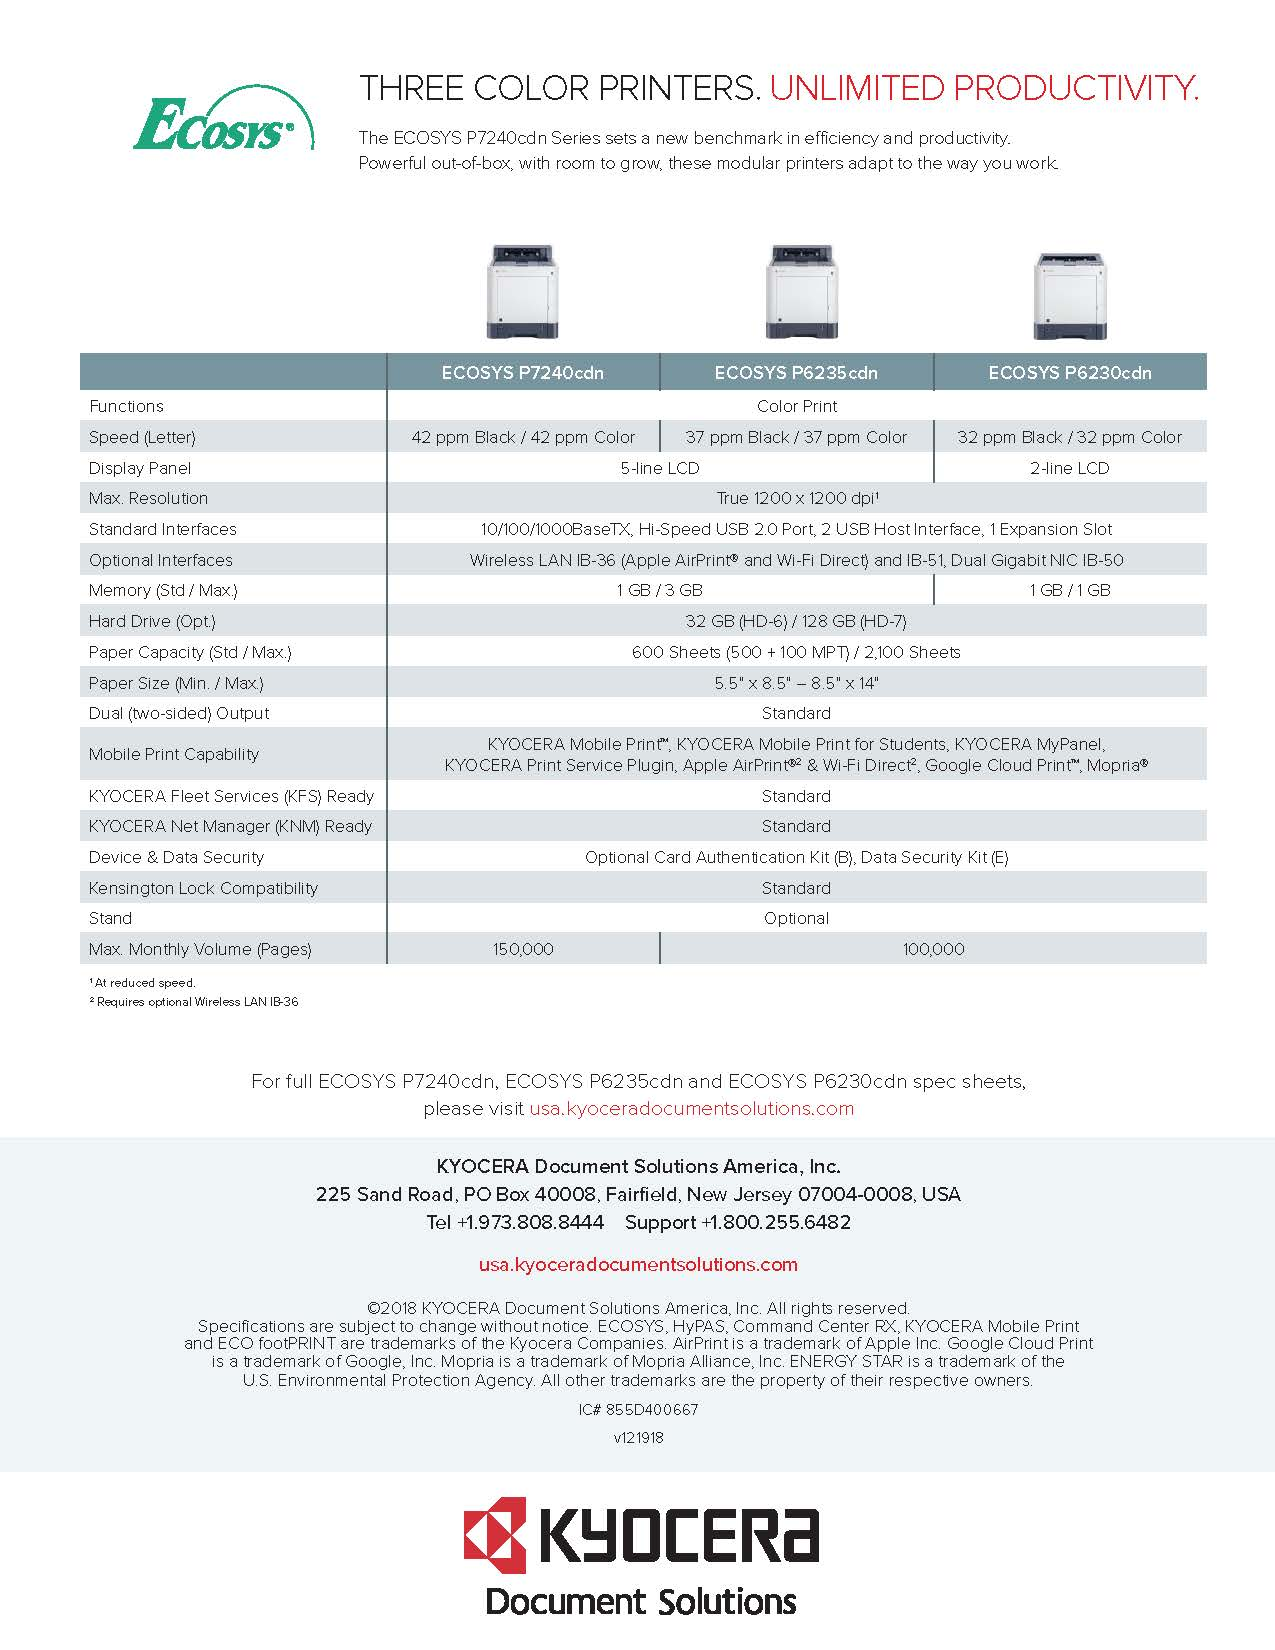 ECOSYS_M6635cidn_P7240cdn_Series_Brochure_Page_6.jpg